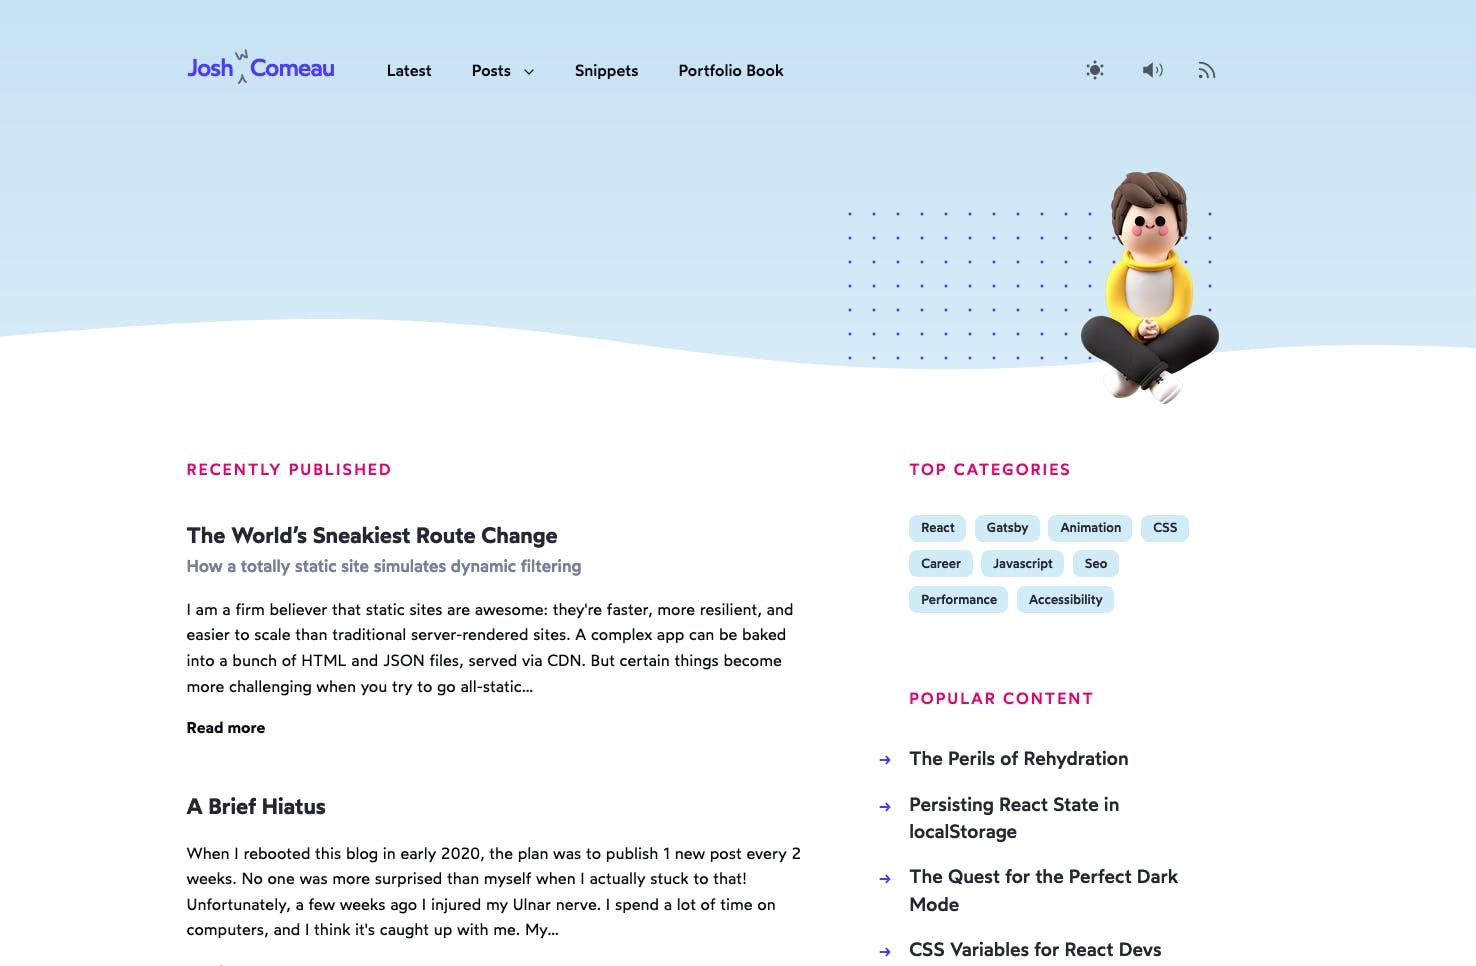 Josh Comeau homepage